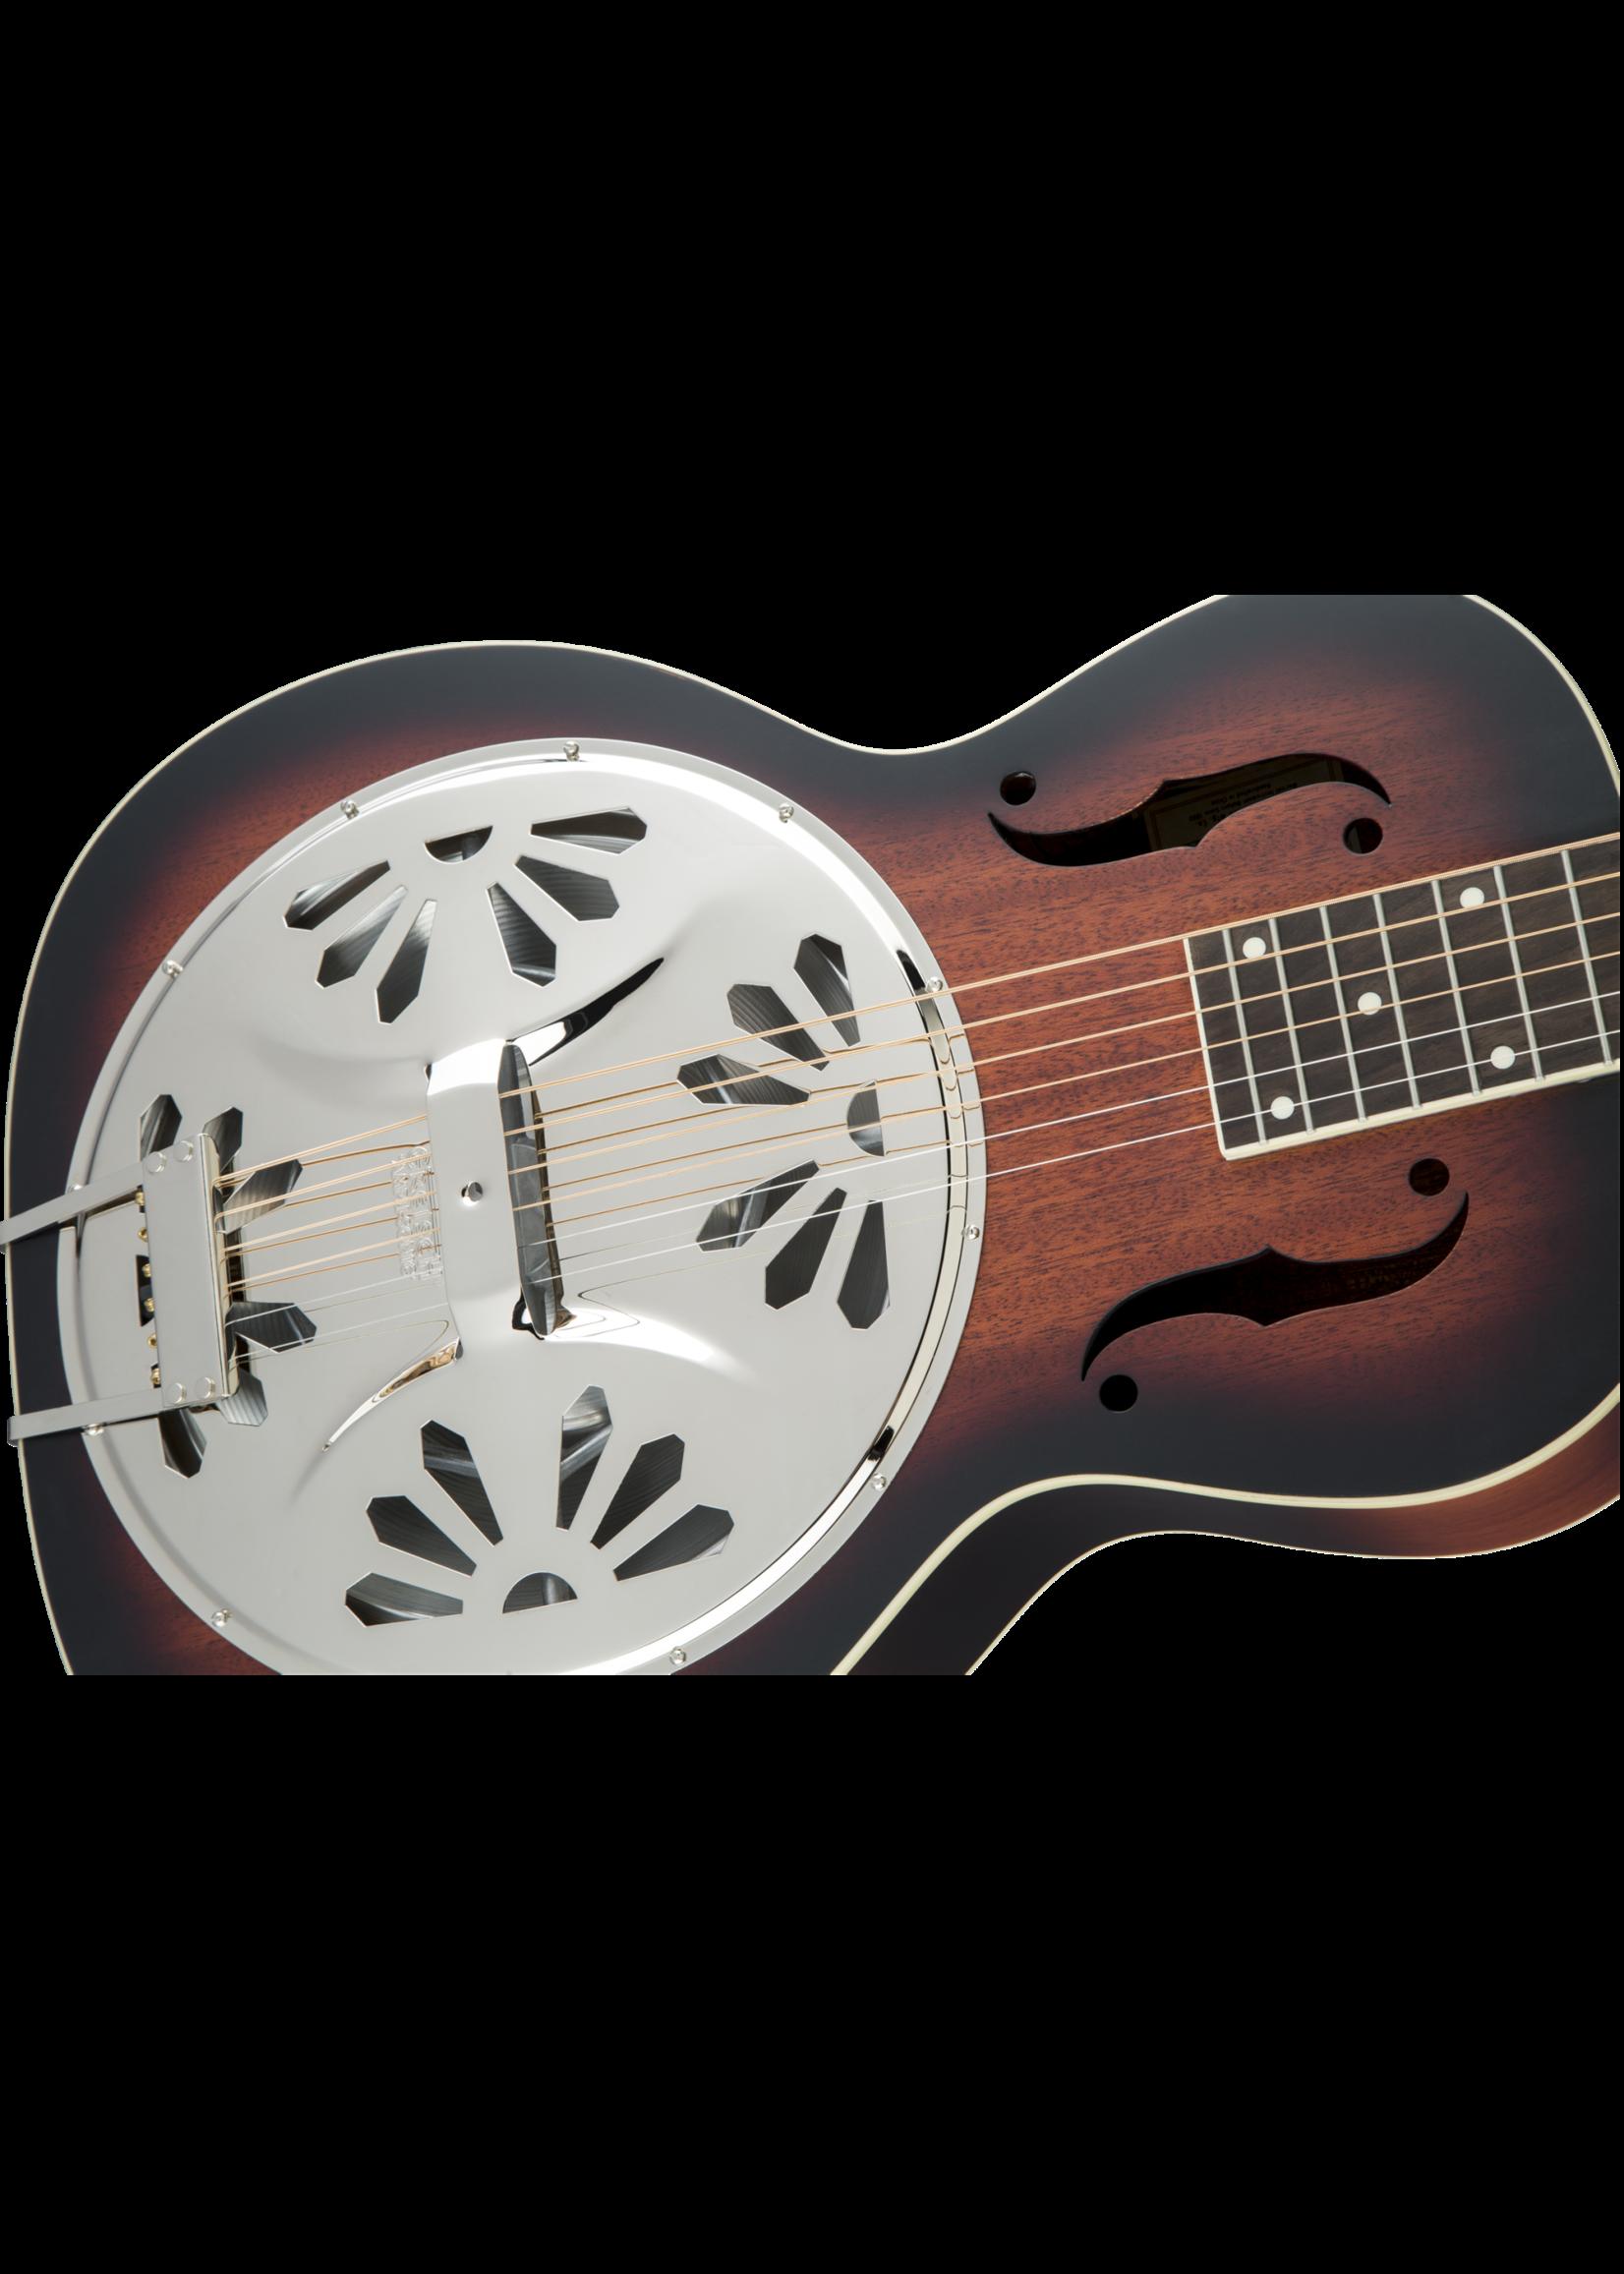 Gretsch Gretsch G9230 Bobtail Square-Neck Resonator Guitar